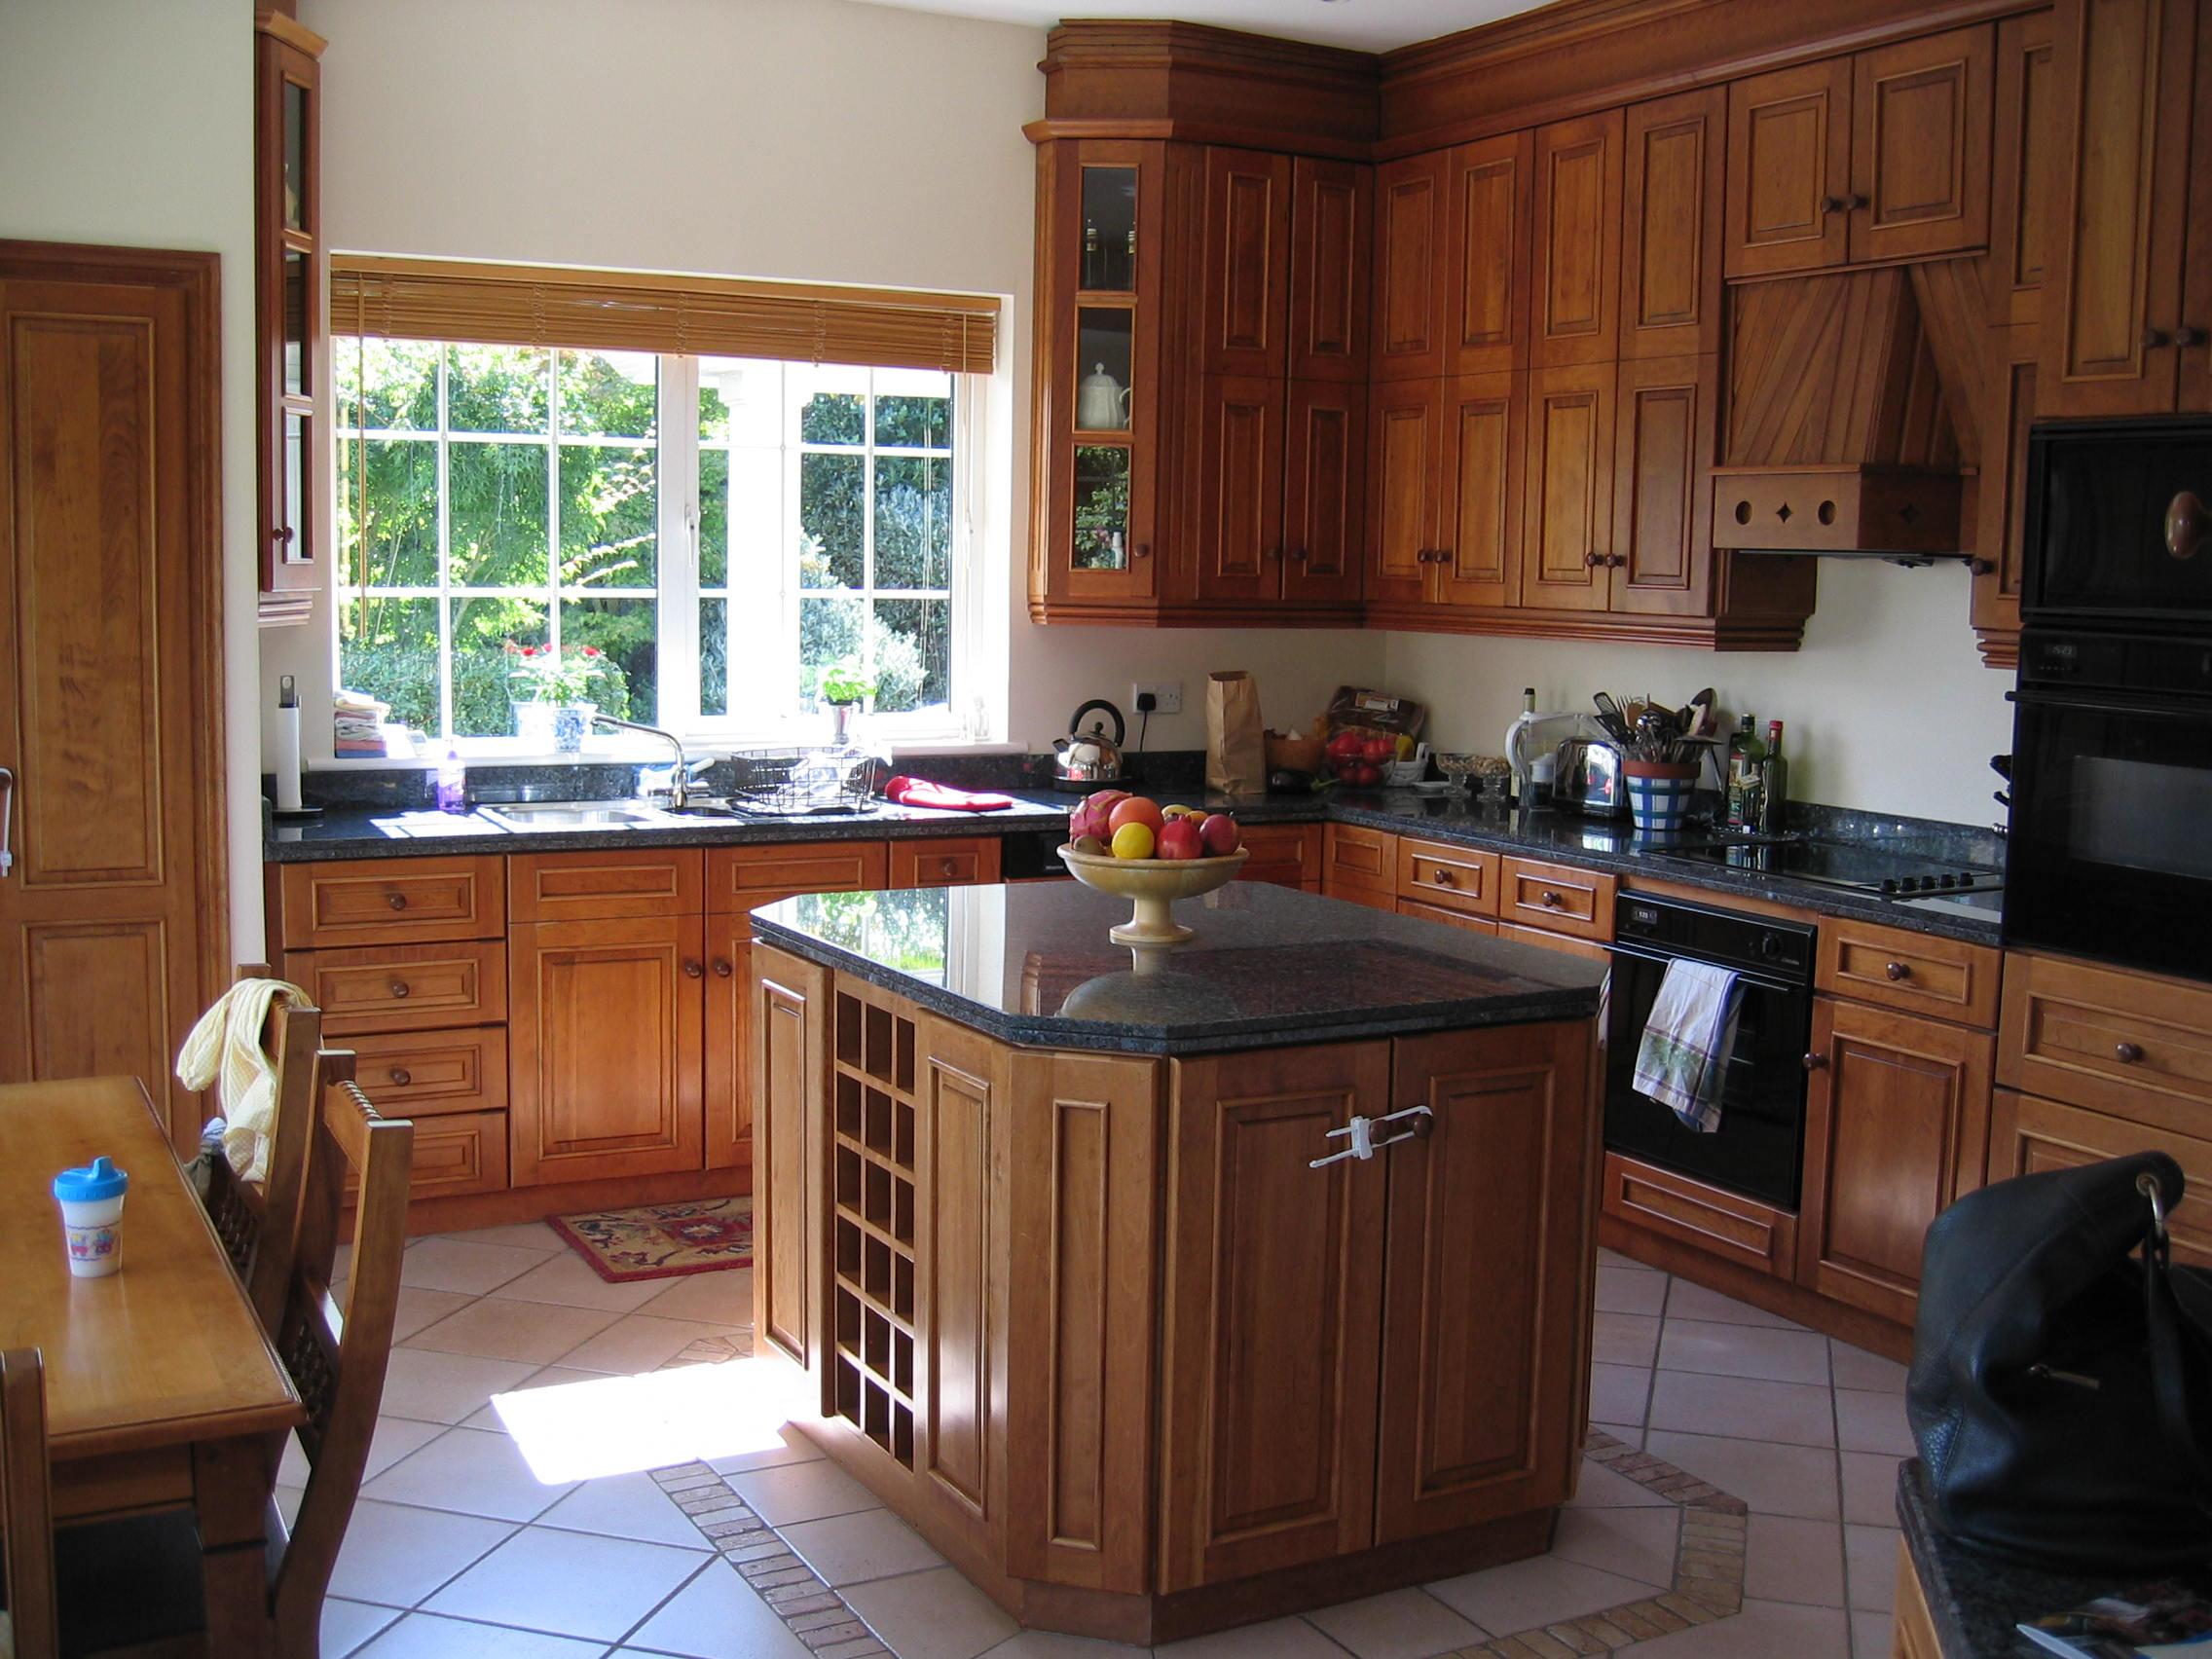 American Kitchen Irish American Kitchen Conversion Charts In An Irish Home